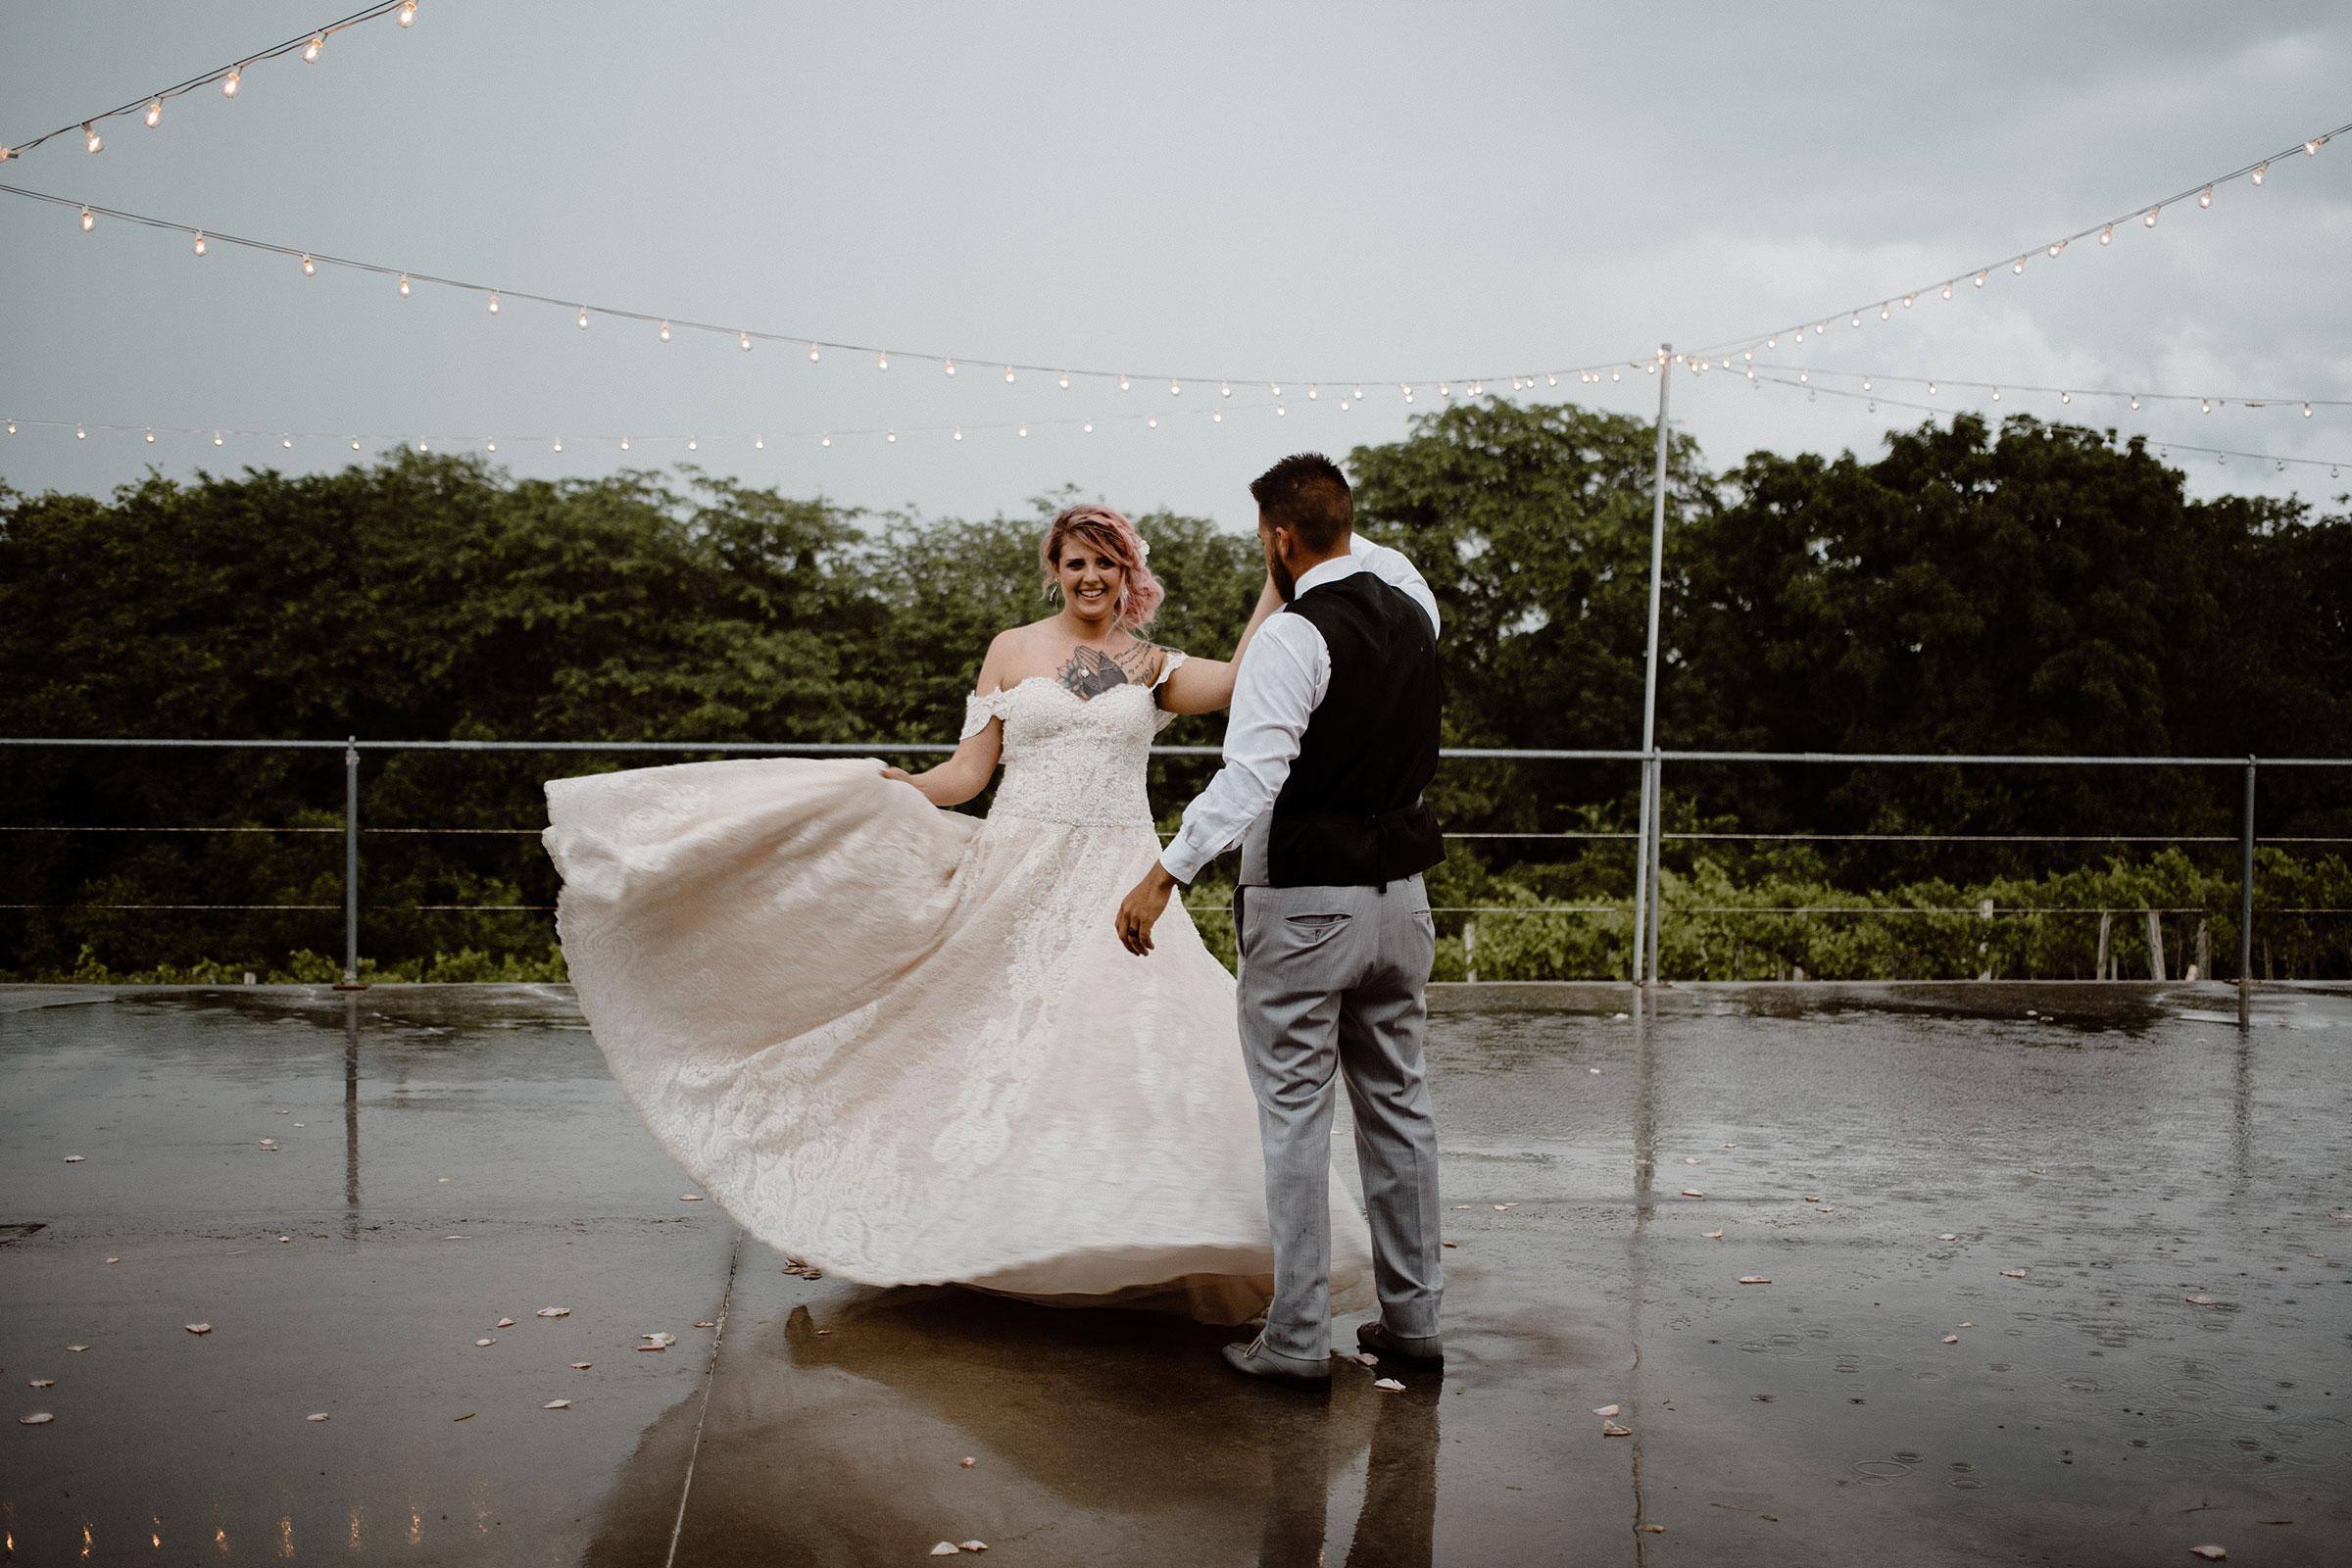 bgroom-spinning-bride-in-rain-puddles-wedding-summerset-winery-indianola-iowa-raelyn-ramey-photography.jpg